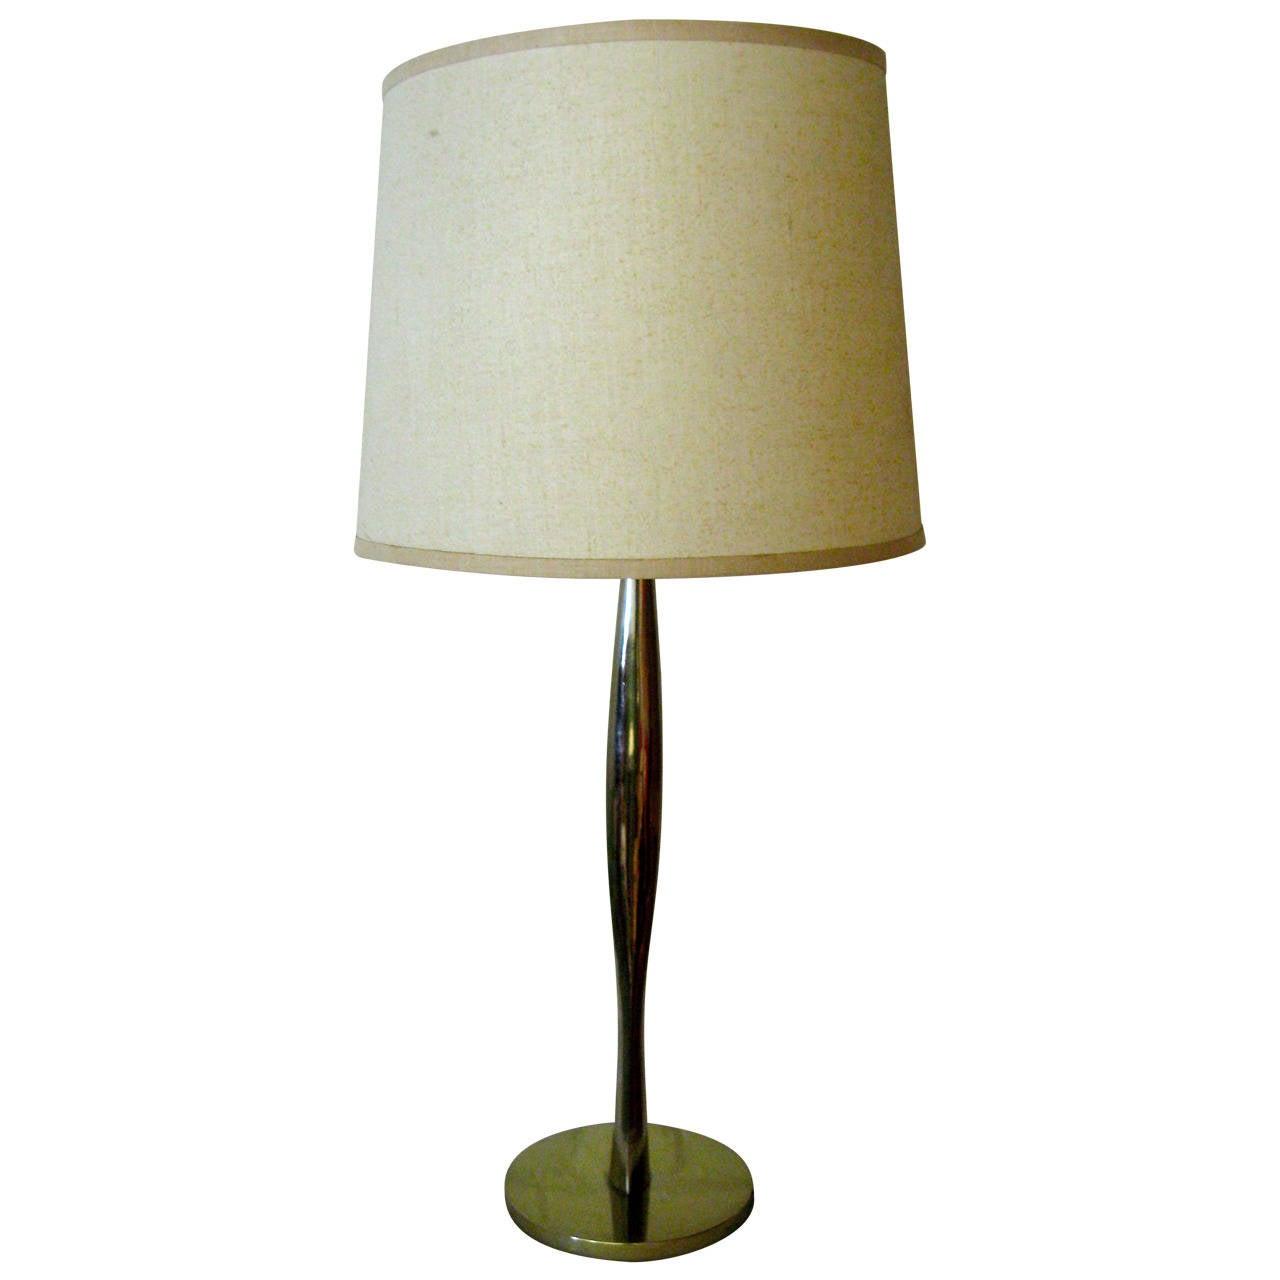 Maurizio Tempestini Design Laurel Table Lamp At 1stdibs